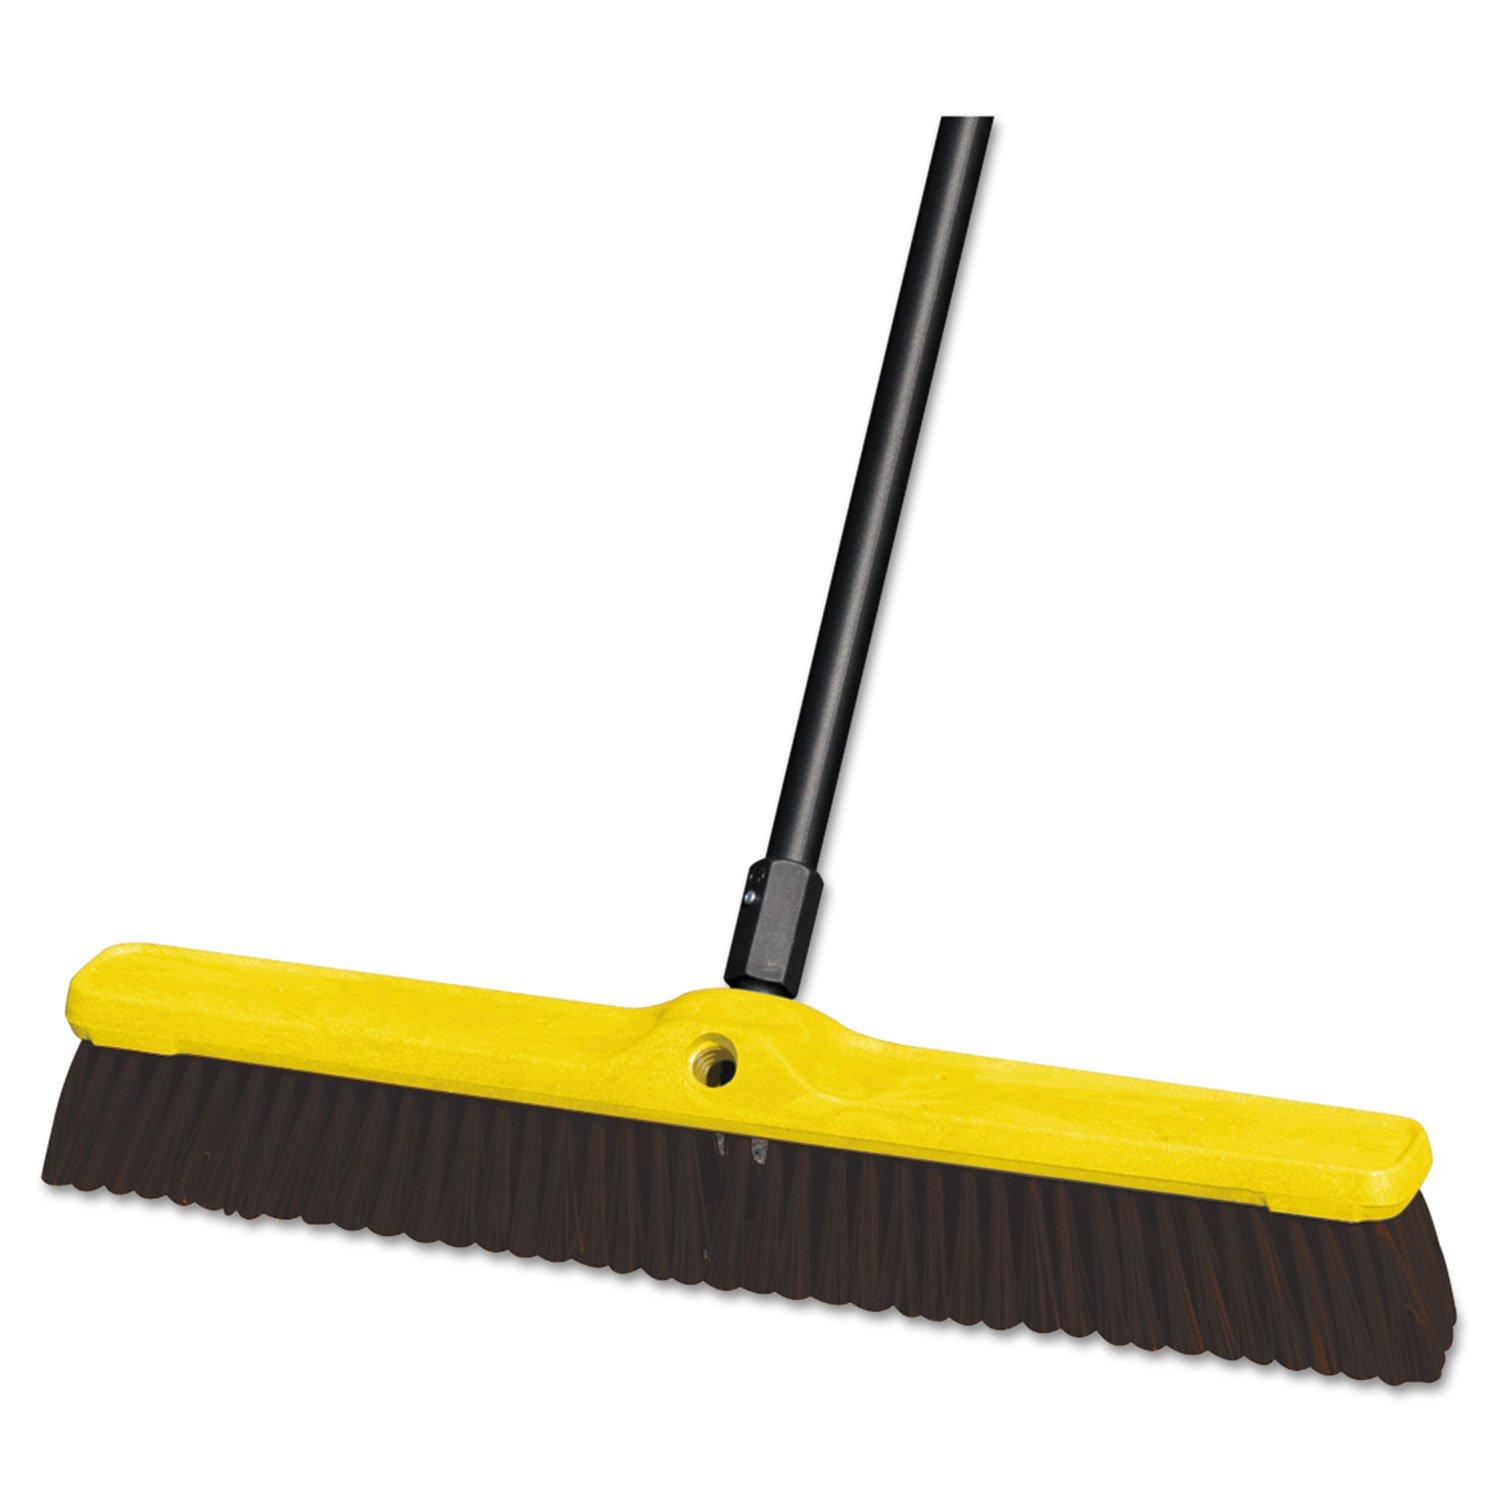 Rubbermaid Commercial Heavy Duty Floor Sweep, 24'' x 3'', Maroon, Polypropylene, 12/Carton